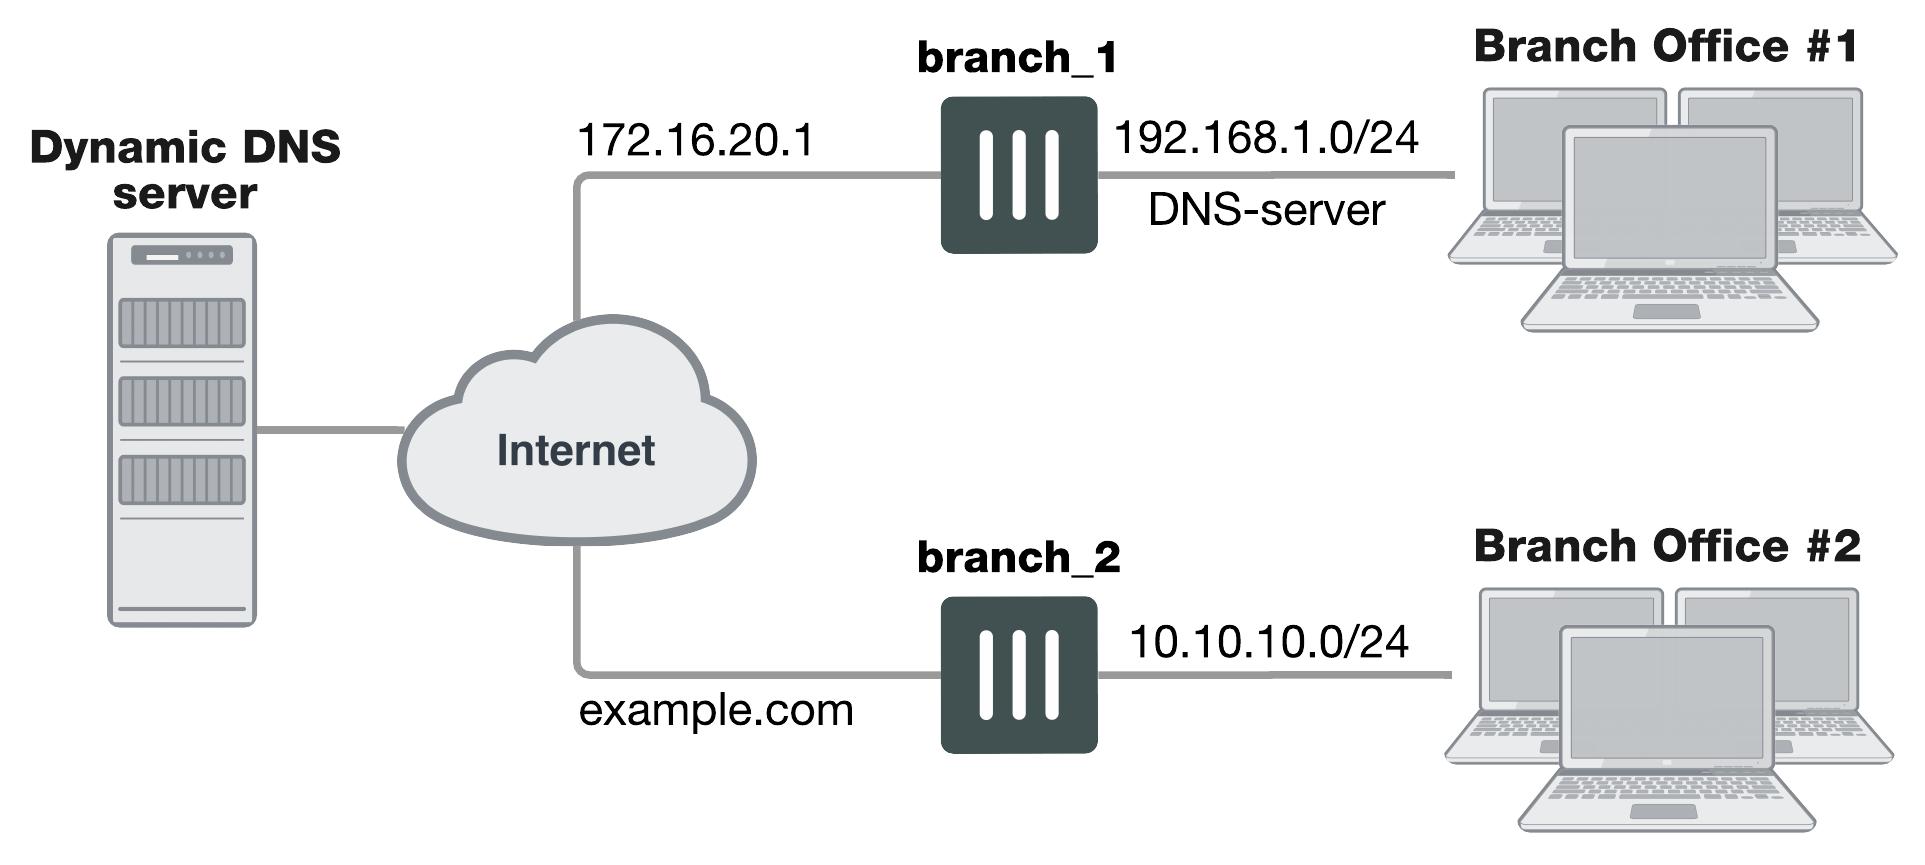 Dynamic DNS configuration